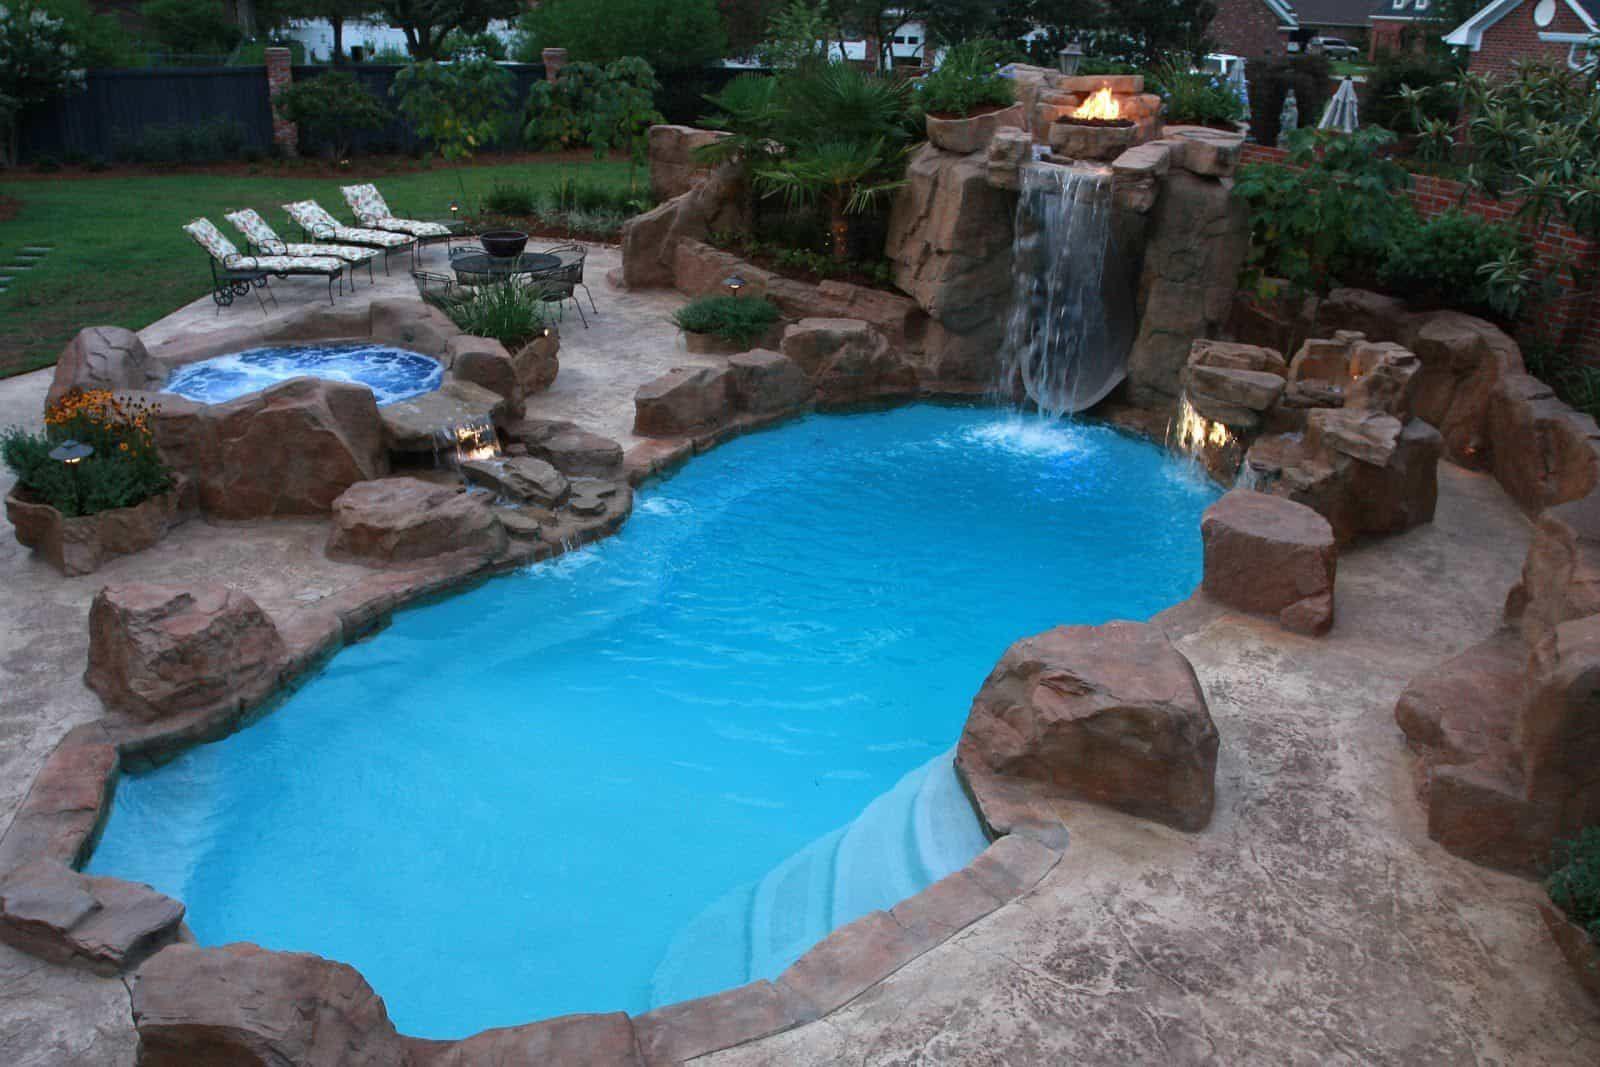 The Benefits Of Saltwater Pools Backyard Pool Cost Small Backyard Pools Backyard Pool Designs